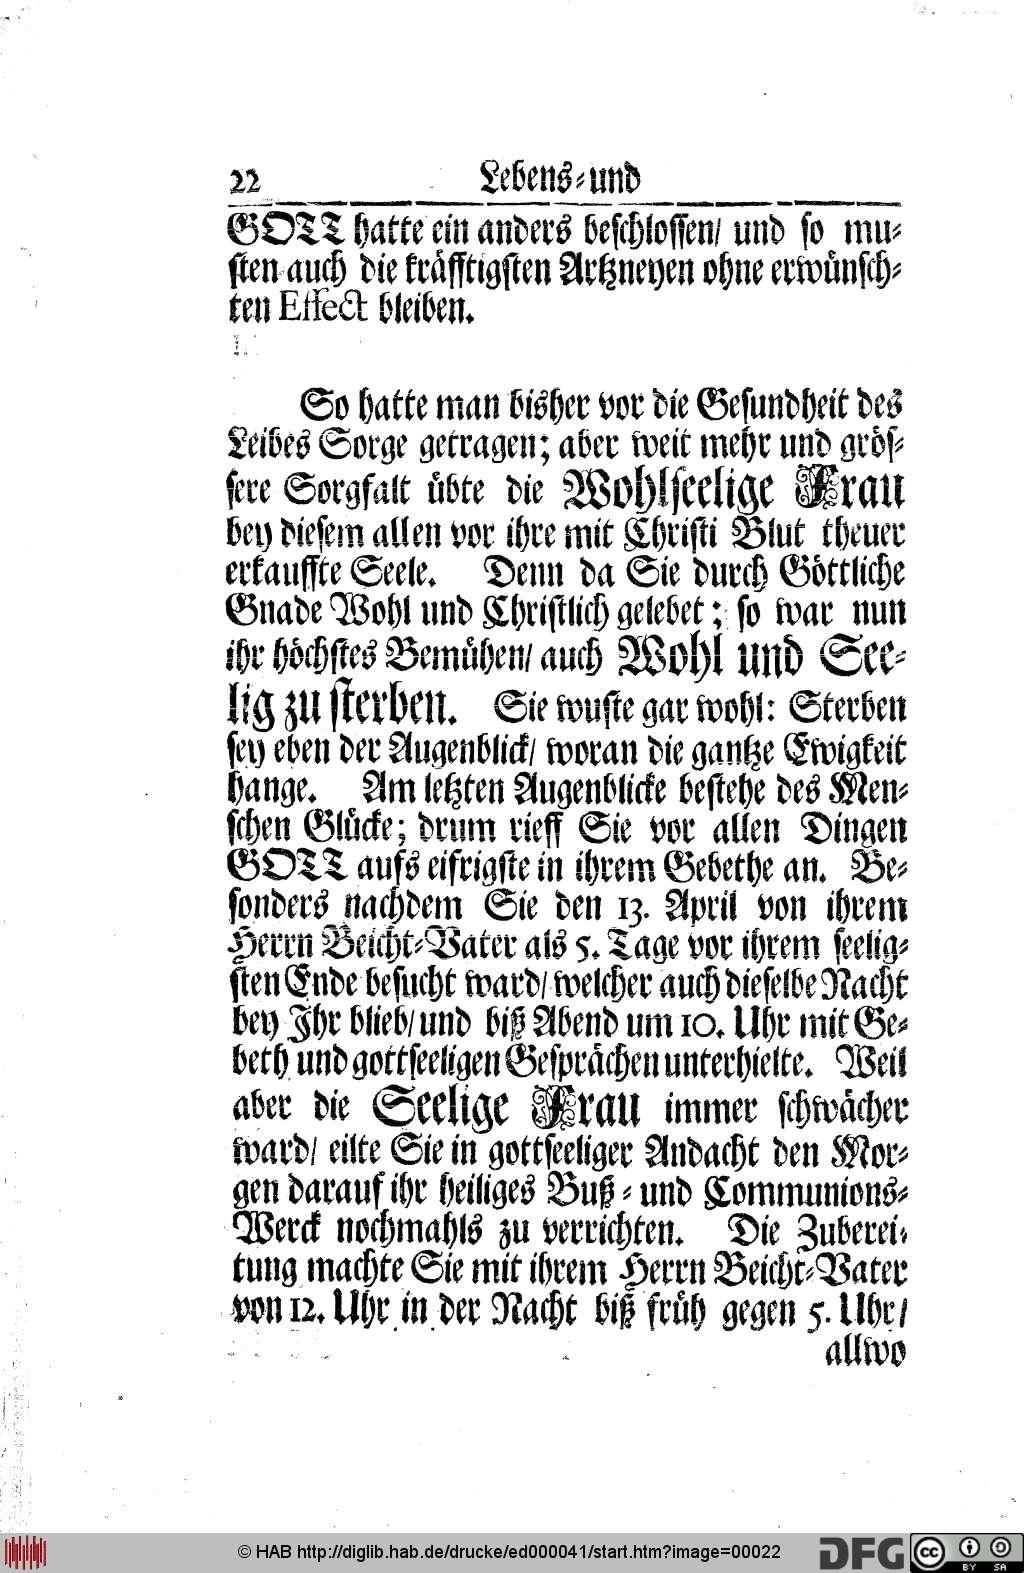 http://diglib.hab.de/drucke/ed000041/00022.jpg